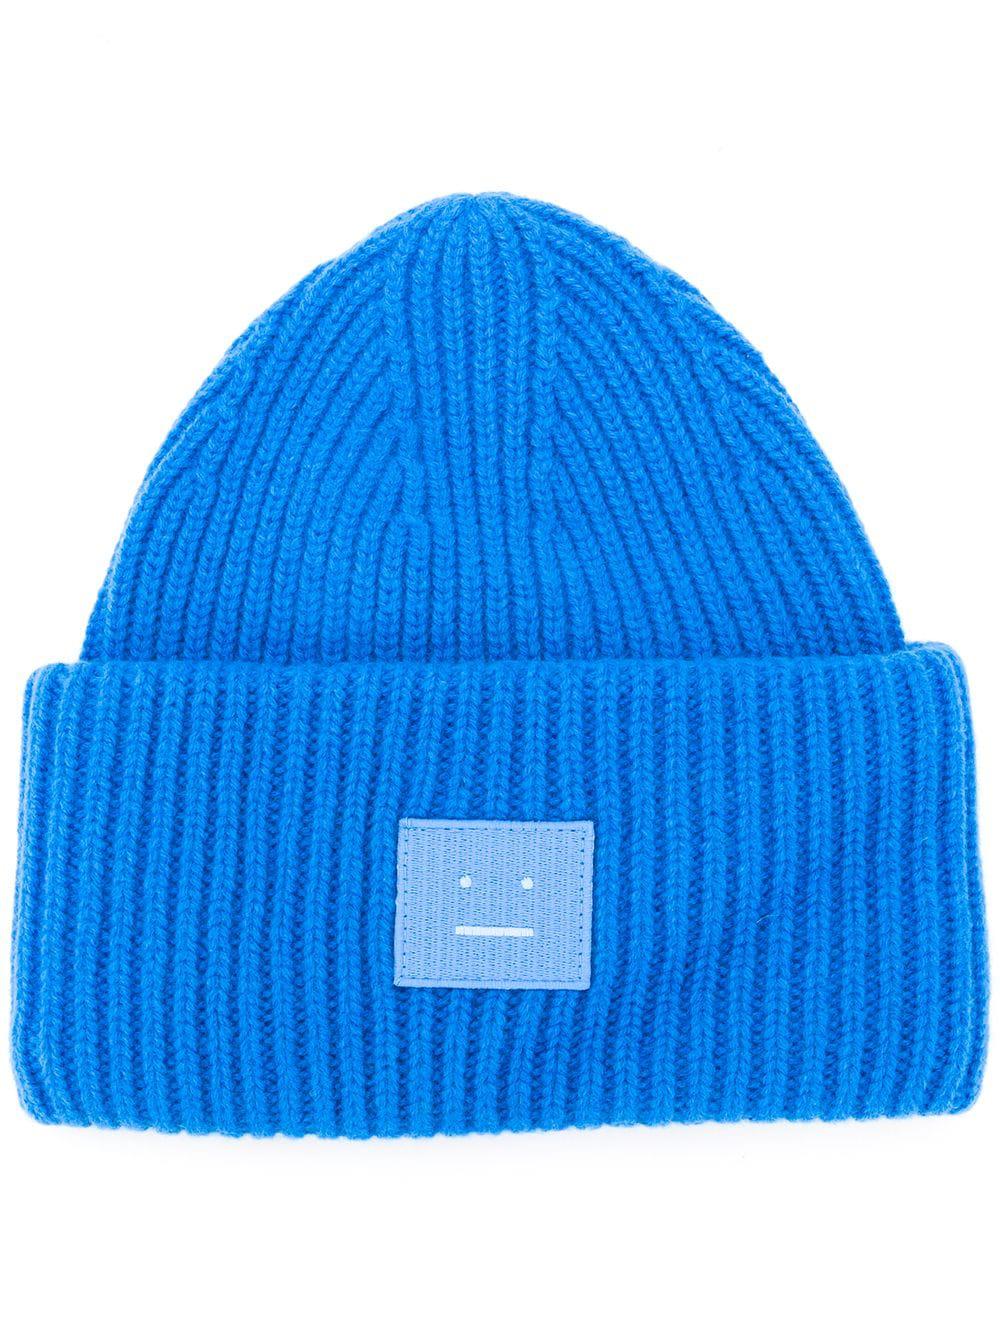 7d7ae425408 Acne Studios Beanie Im Oversized-Look - Blau In Blue